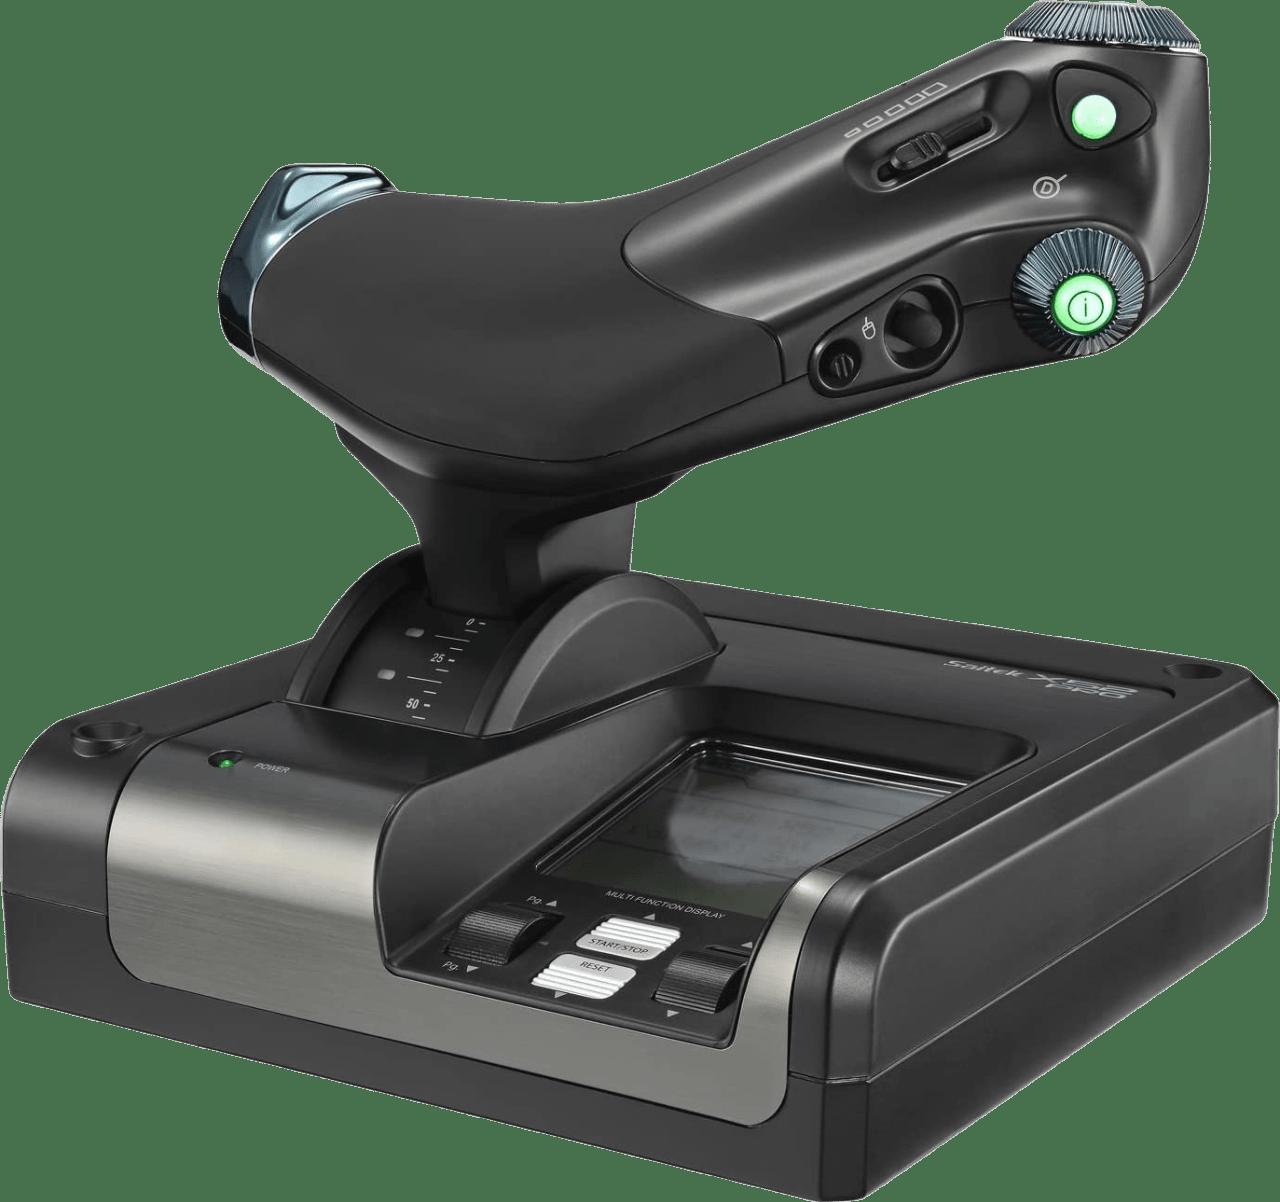 Negro Logitech Saitek X52 PRO Flight Simulator Controller.4